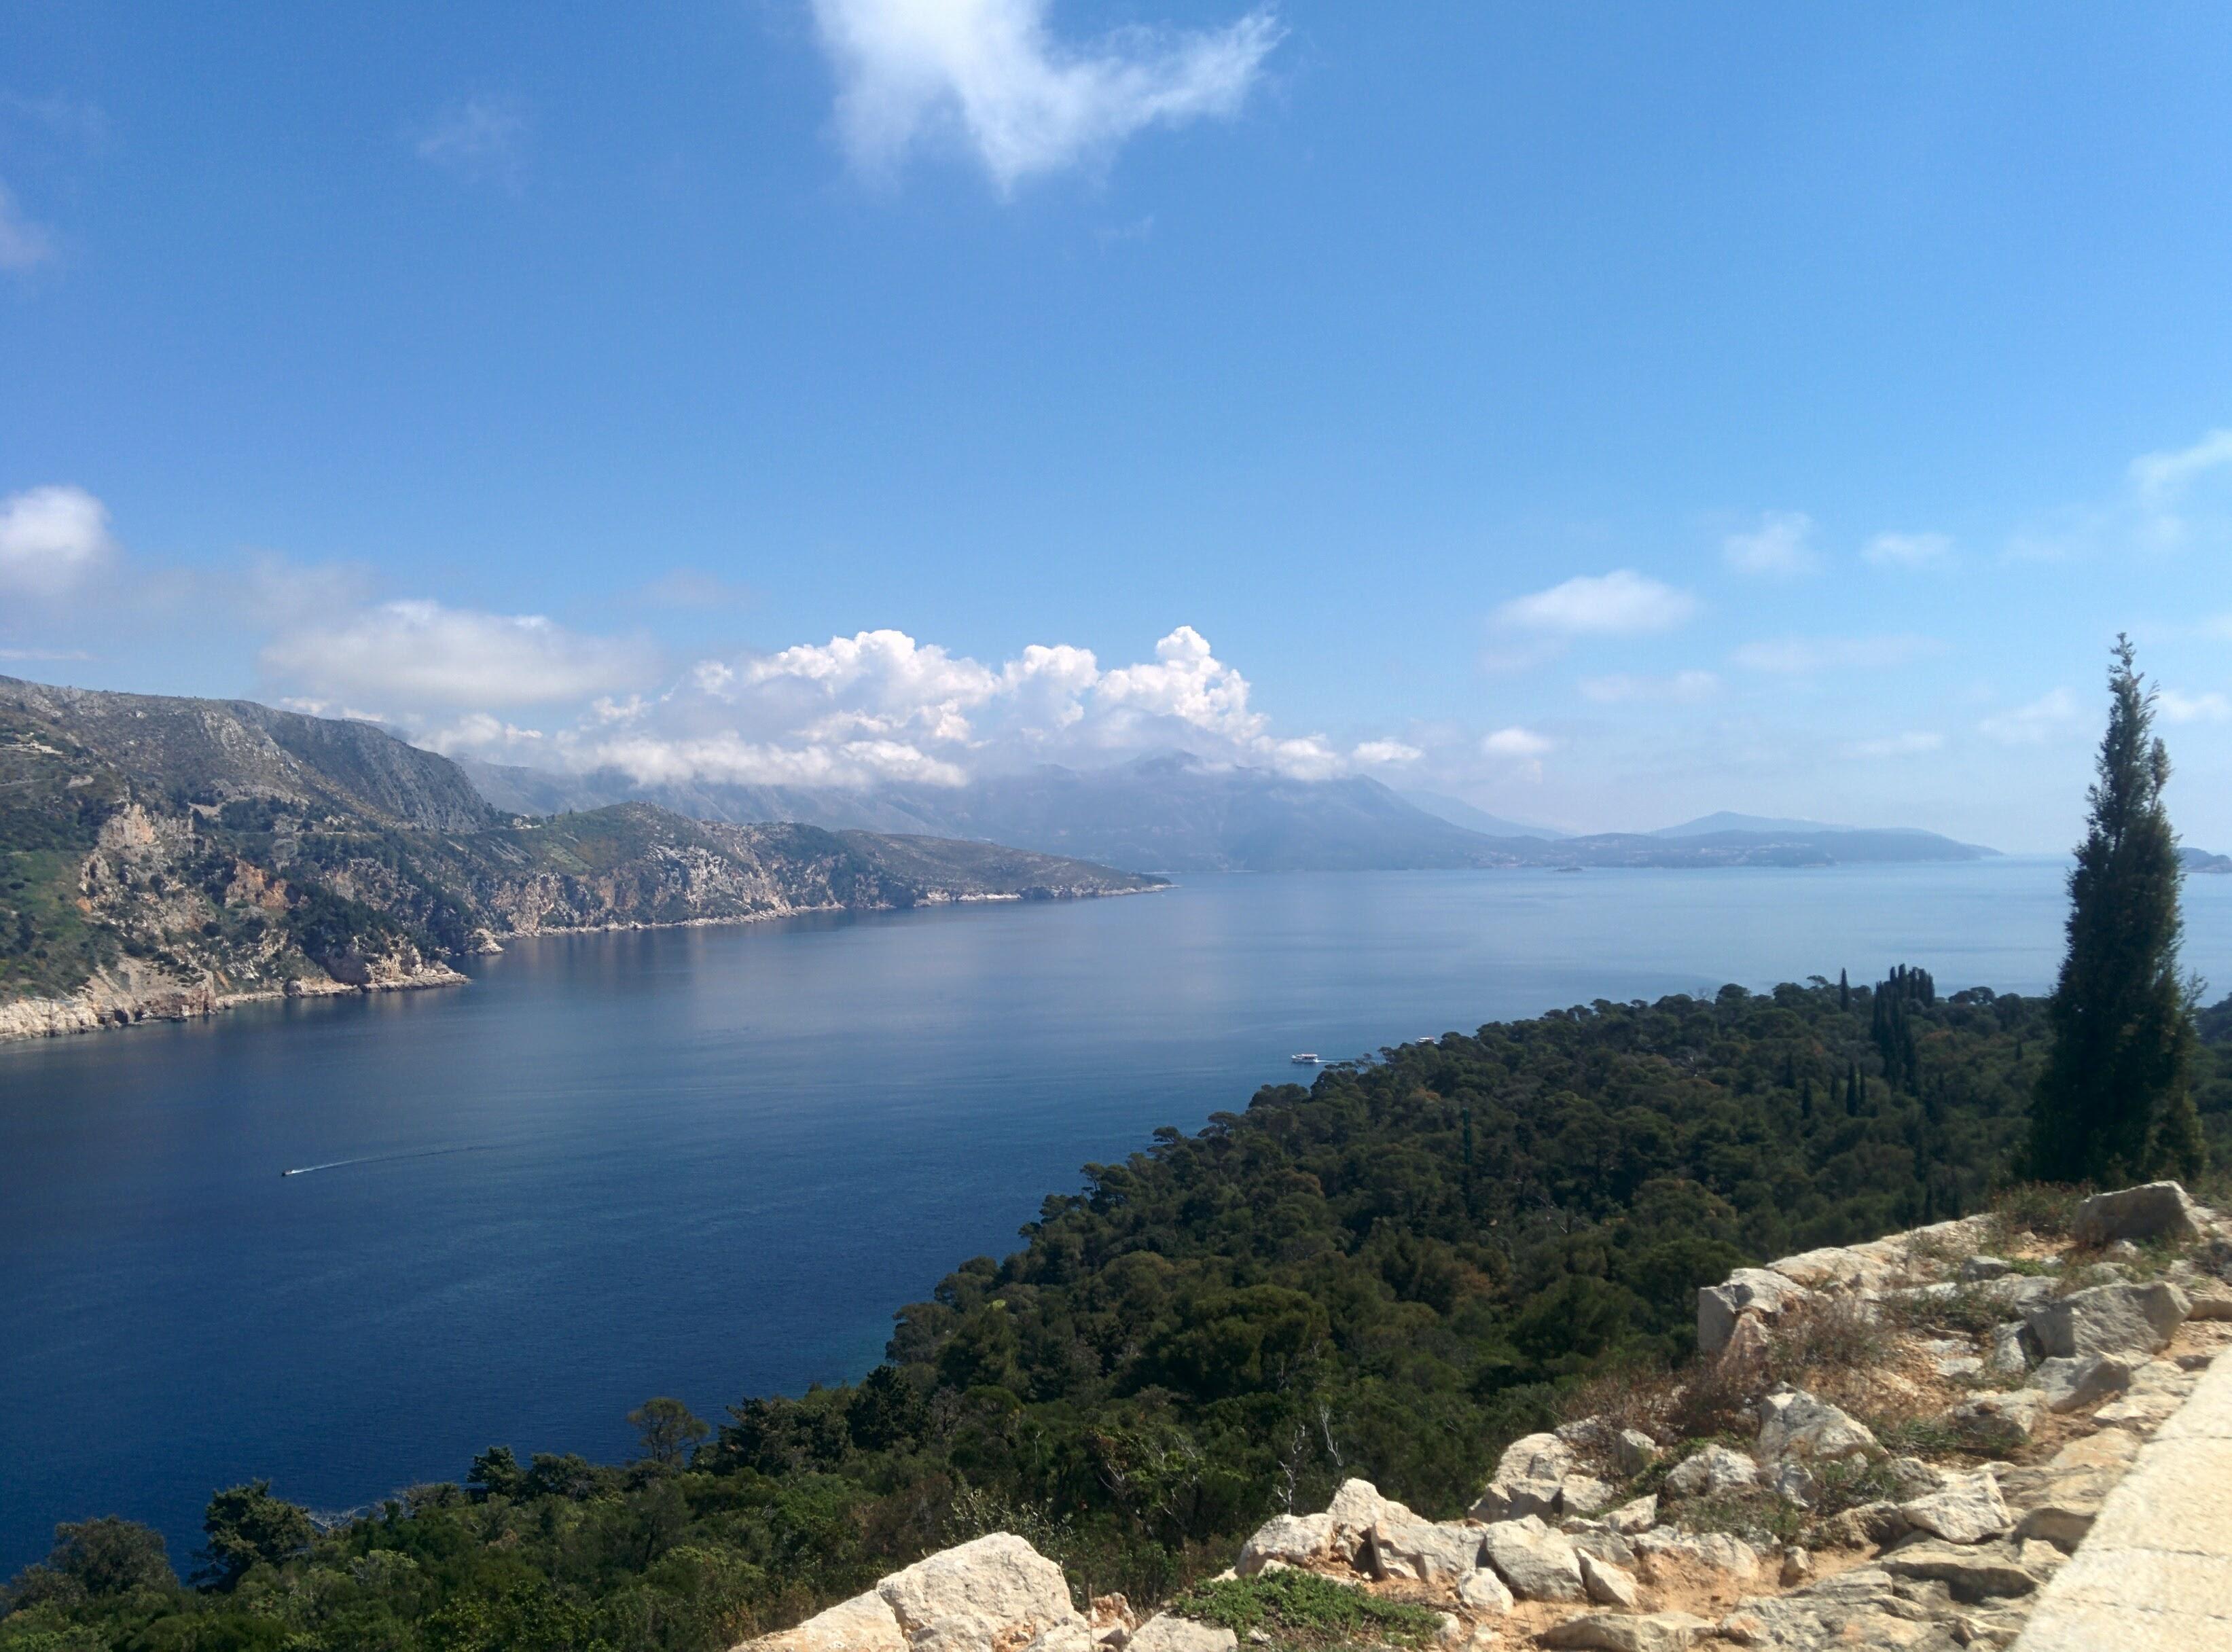 Sea view and the Dubrovnik coastline.